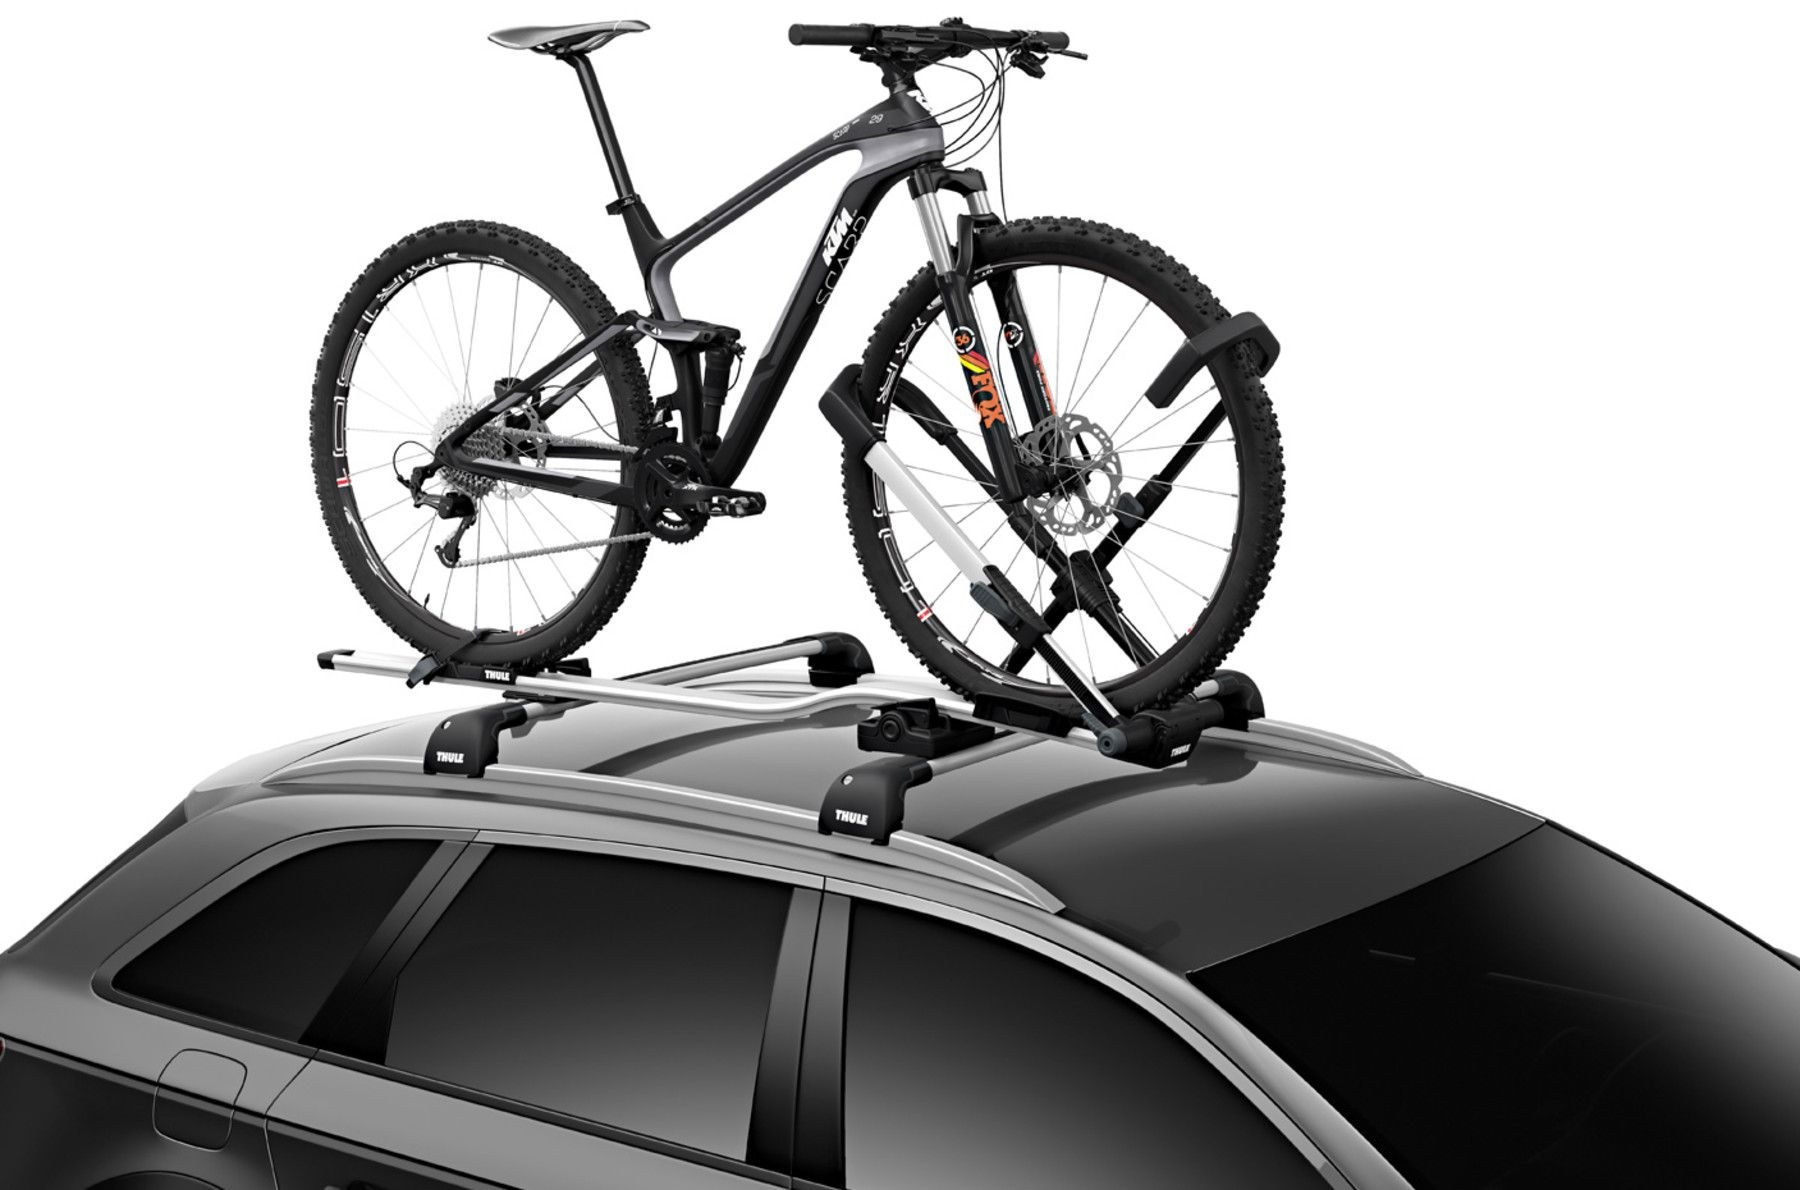 Suporte de Teto para Bicicleta Thule UpRide